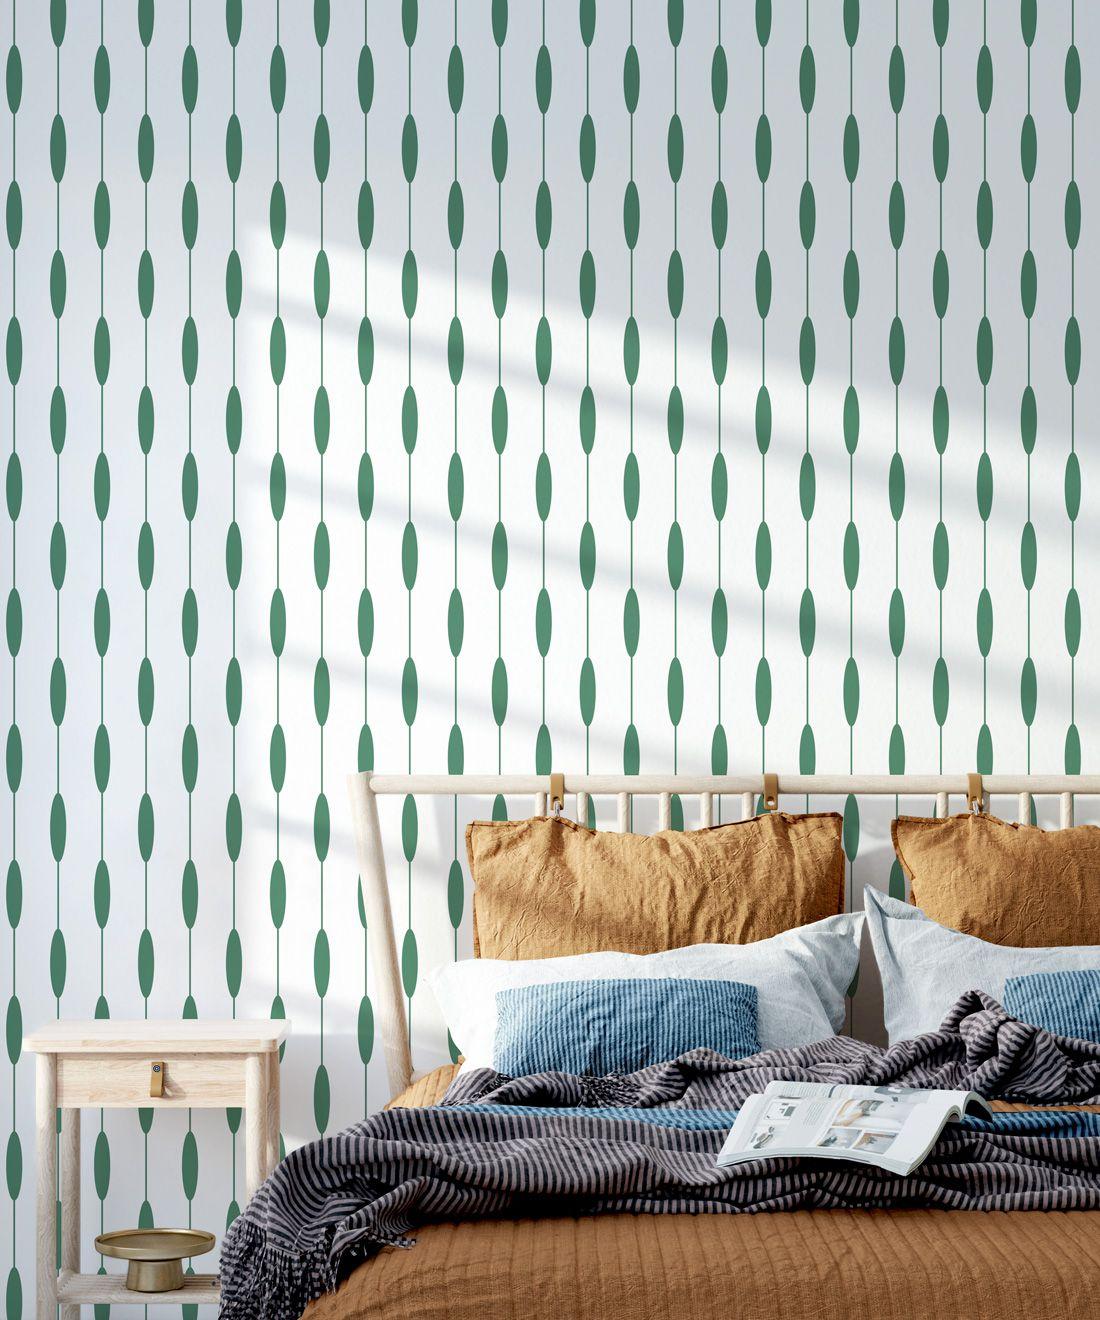 Bowline Wallpaper • Geometric Wallpaper • Striped Wallpaper • Green Wallpaper •Insitu